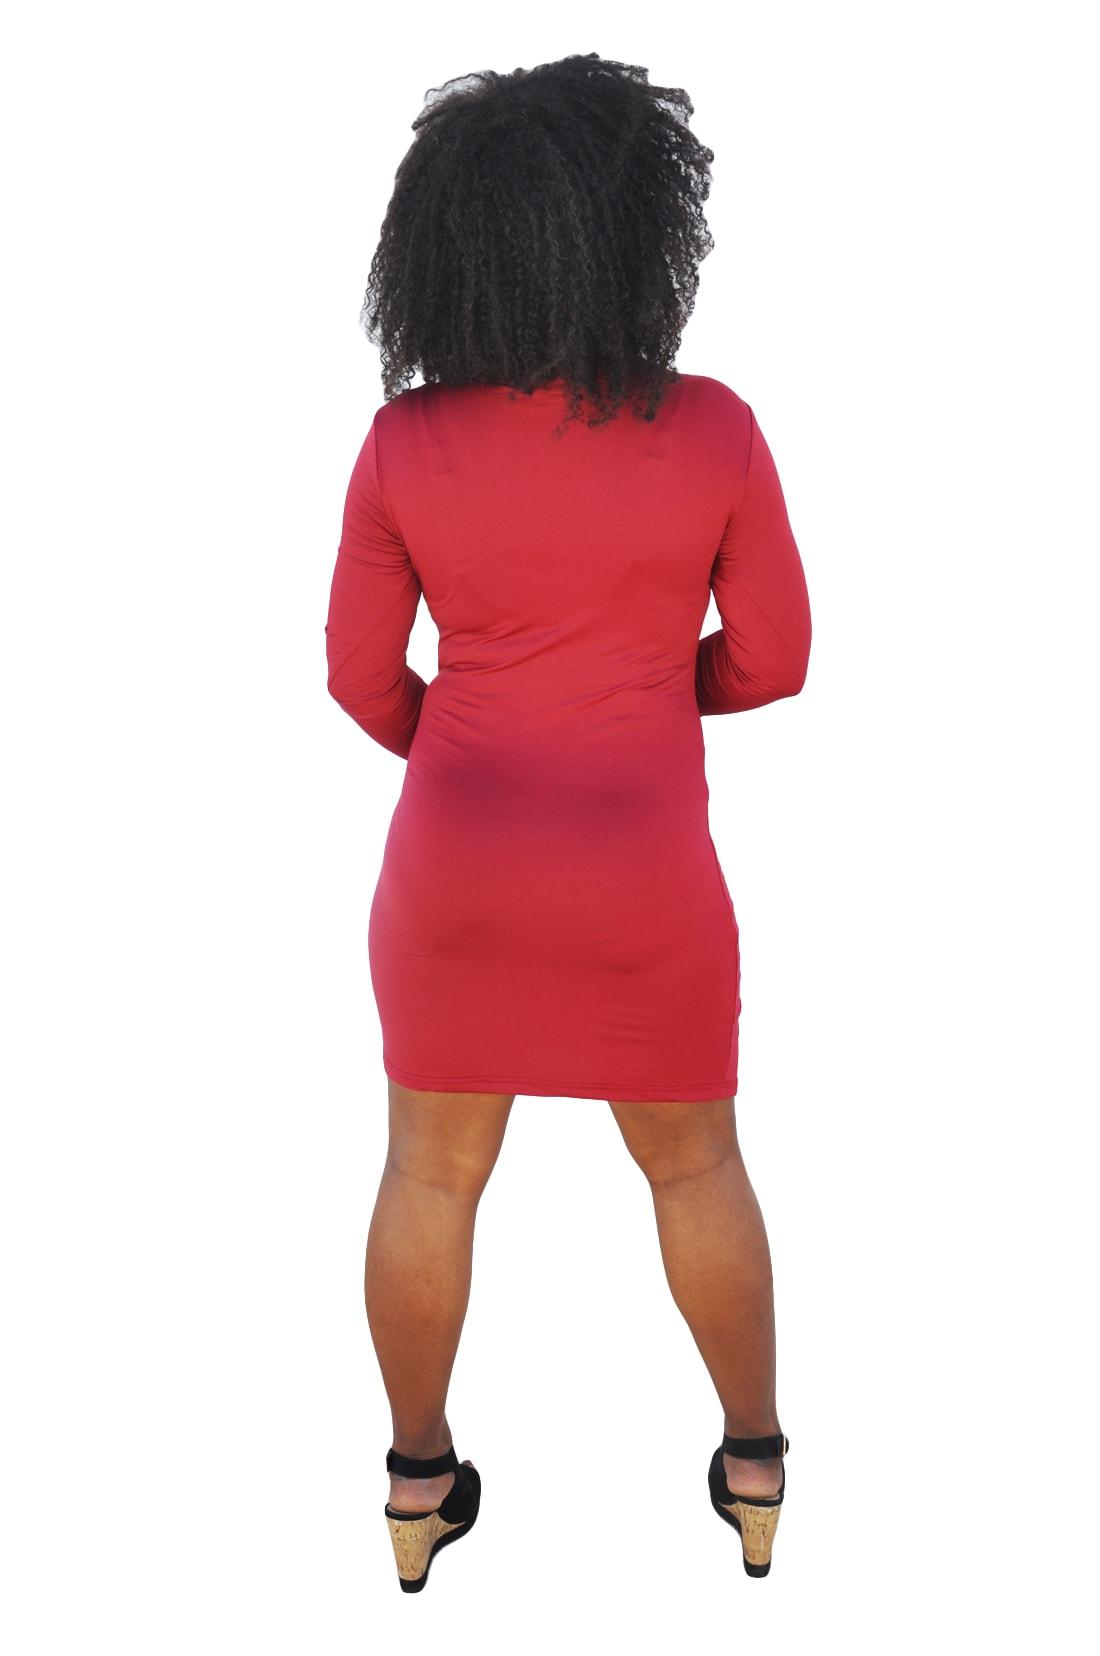 M0236 red3 Long Sleeve Dresses maureens.com boutique